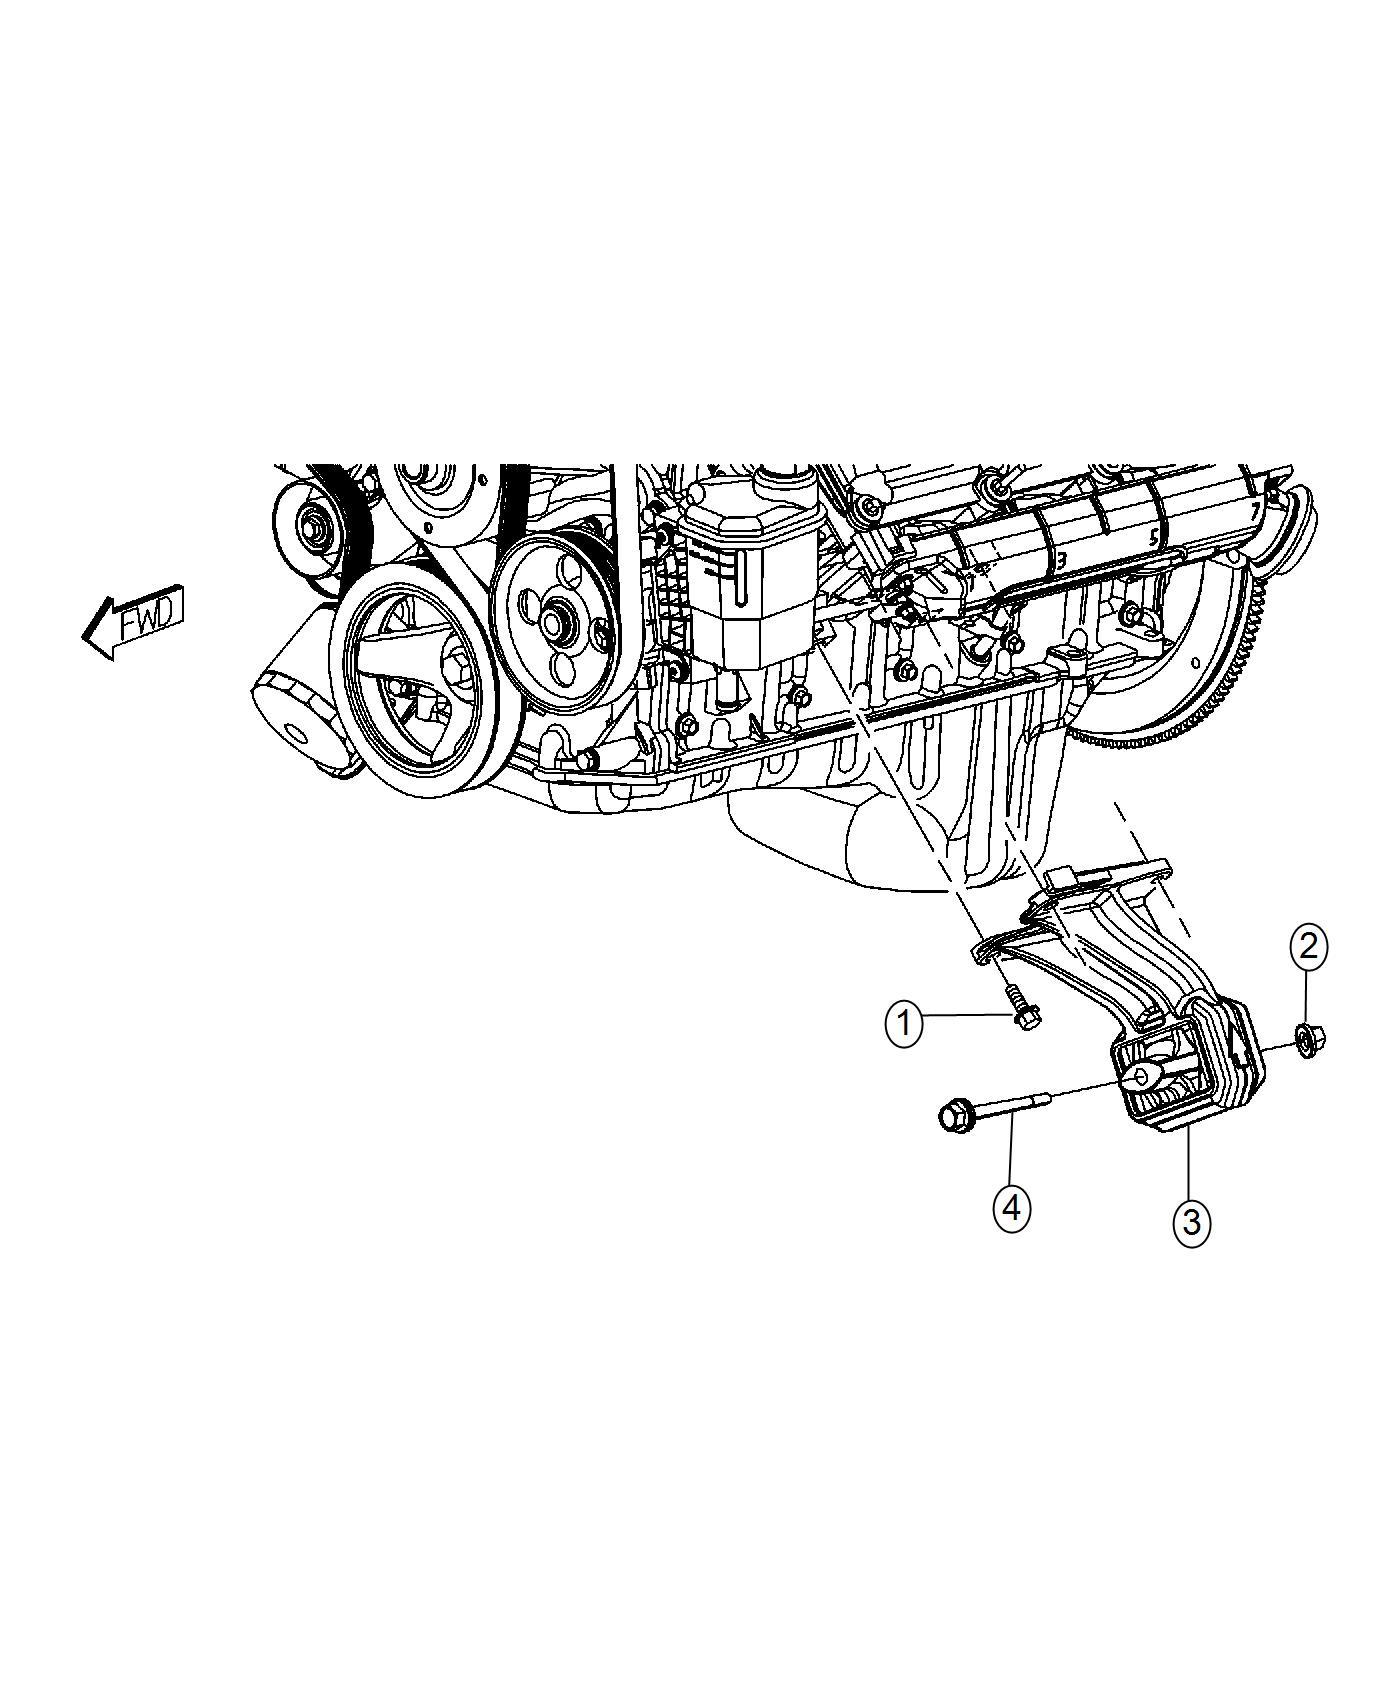 Ram Insulator Engine Mount Left Side Mounting Rwd